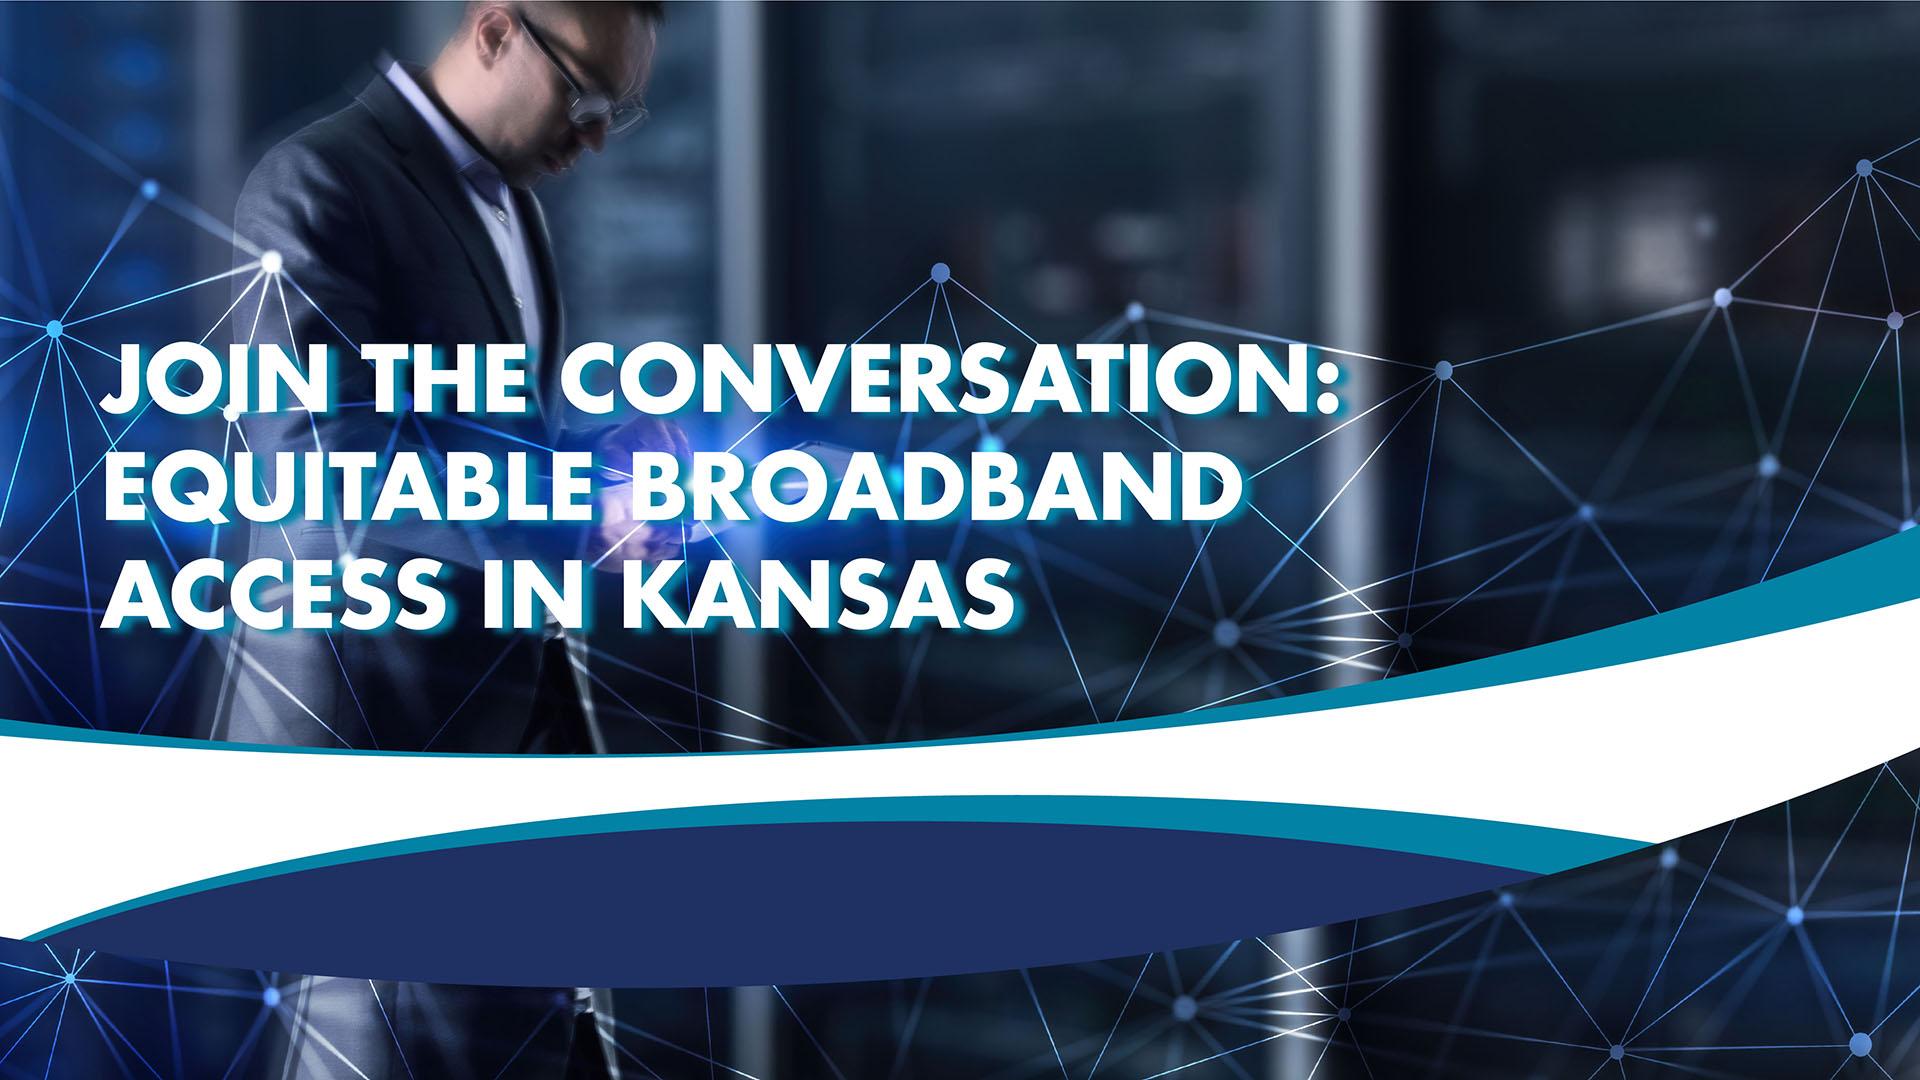 Equitable Broadband Access in Kansass